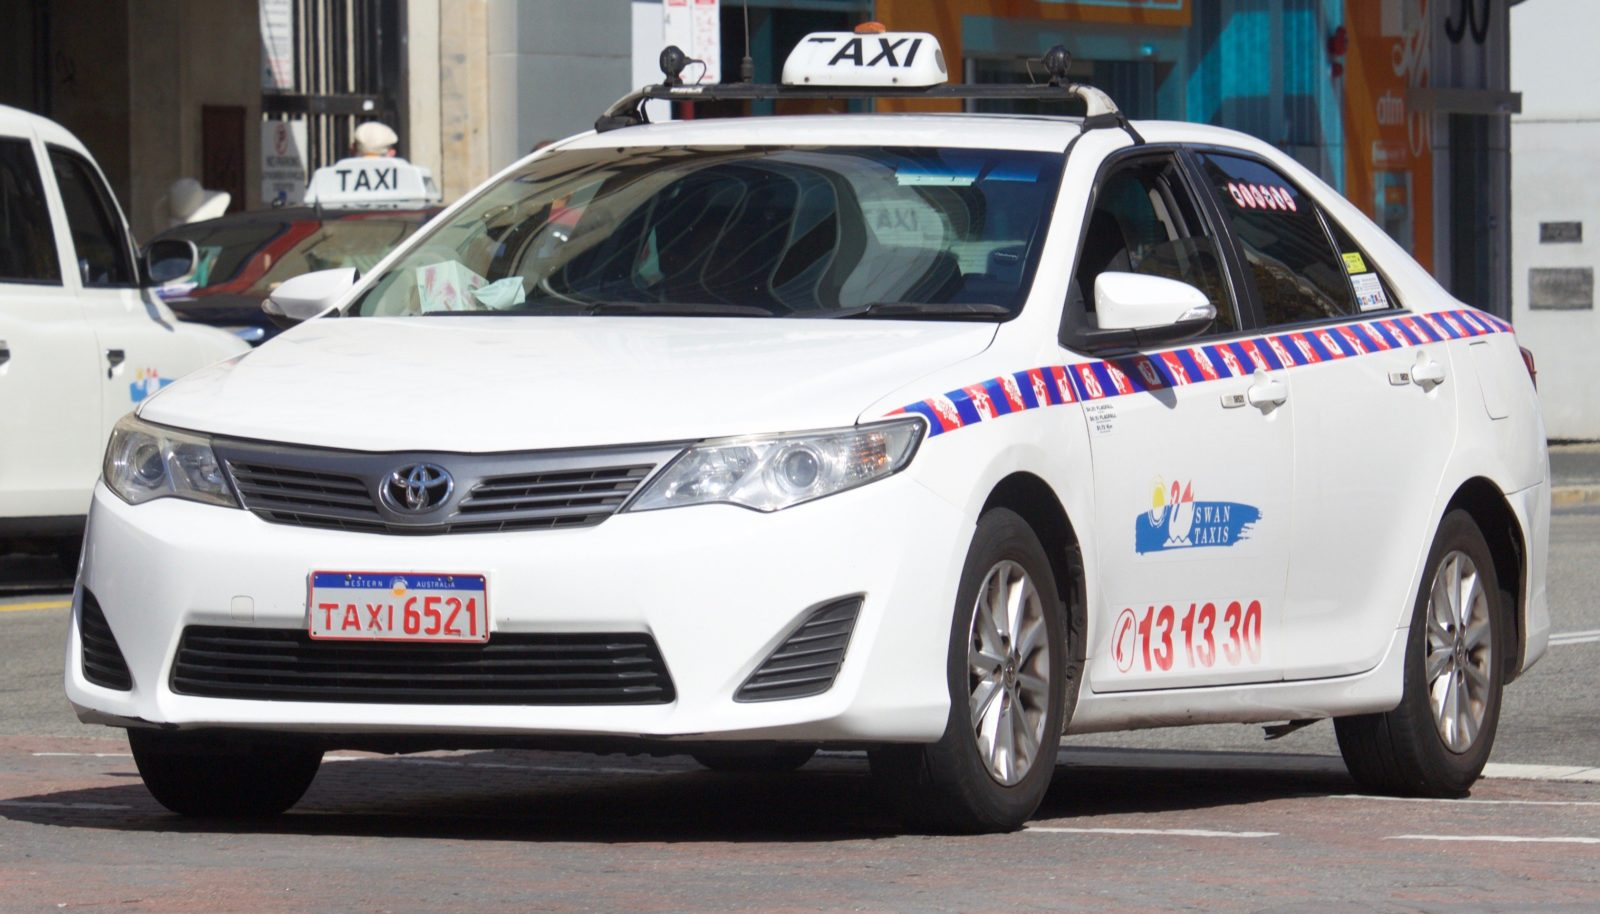 Swan Taxis, Perth, Western Australia